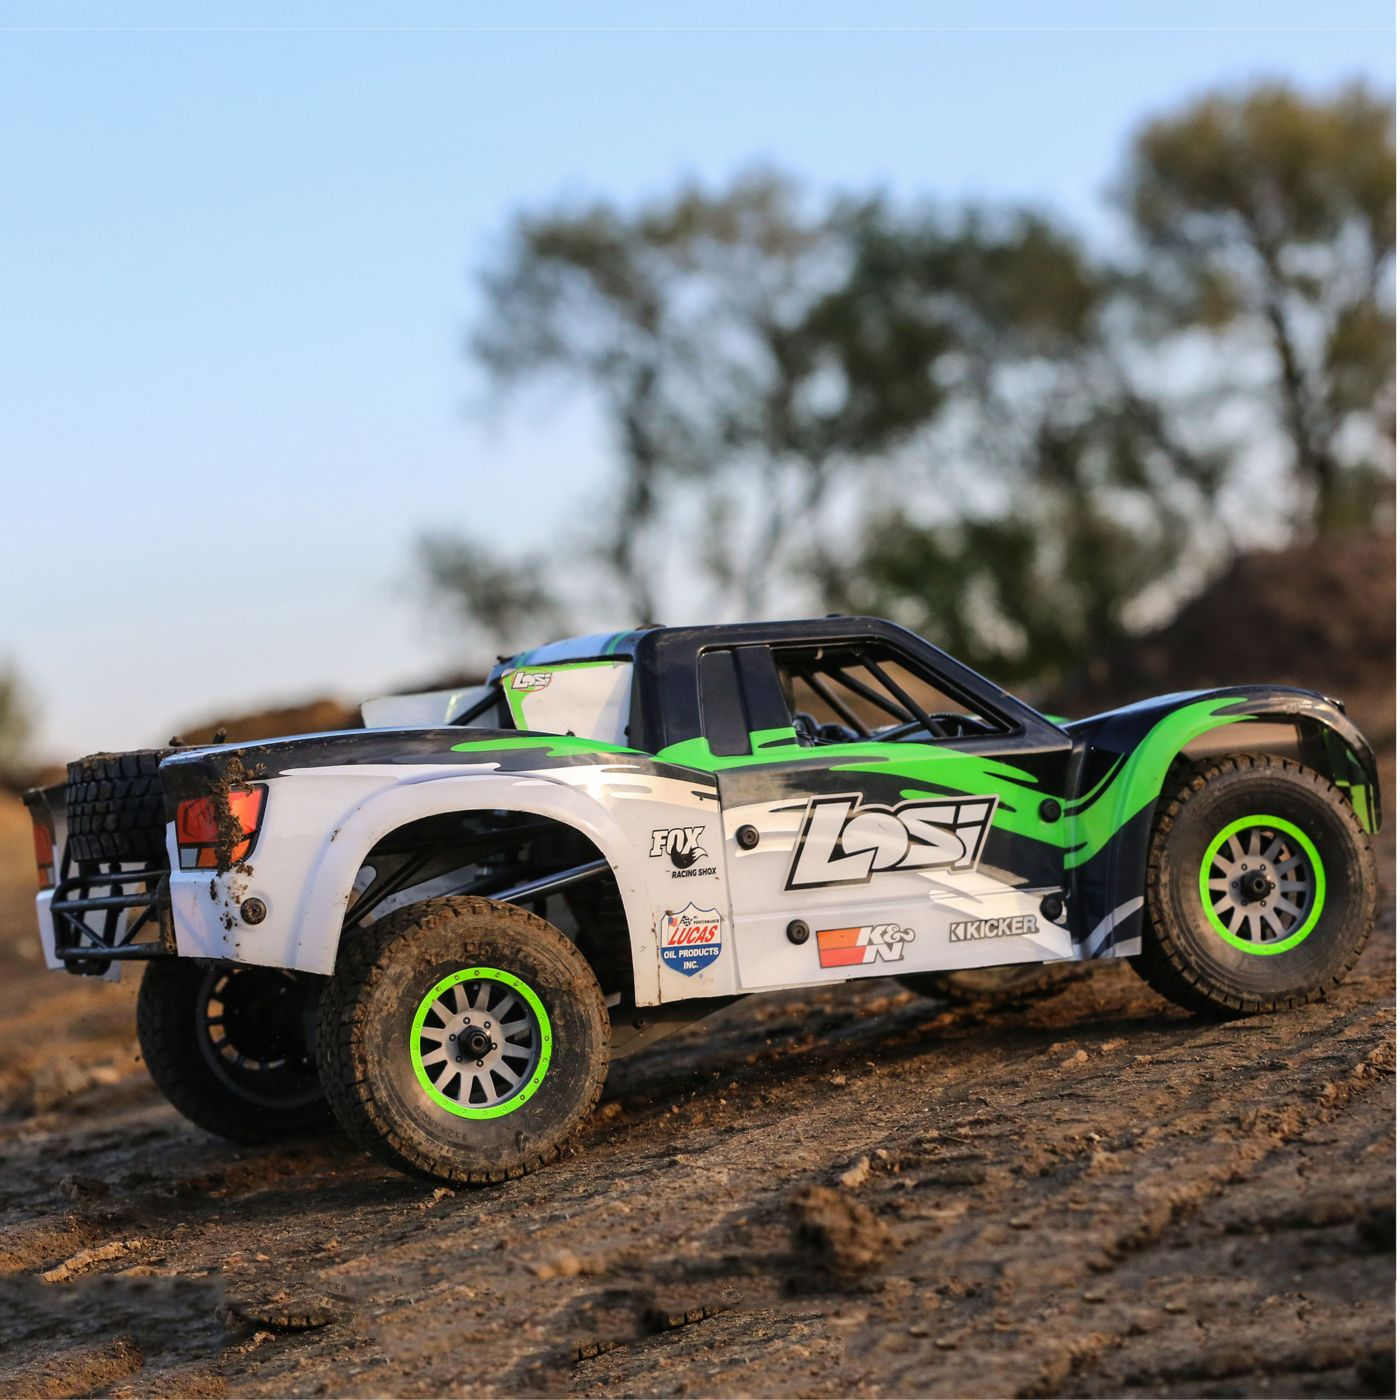 Losi Super Baja Rey Brushless 1/6 4WD RTR 12